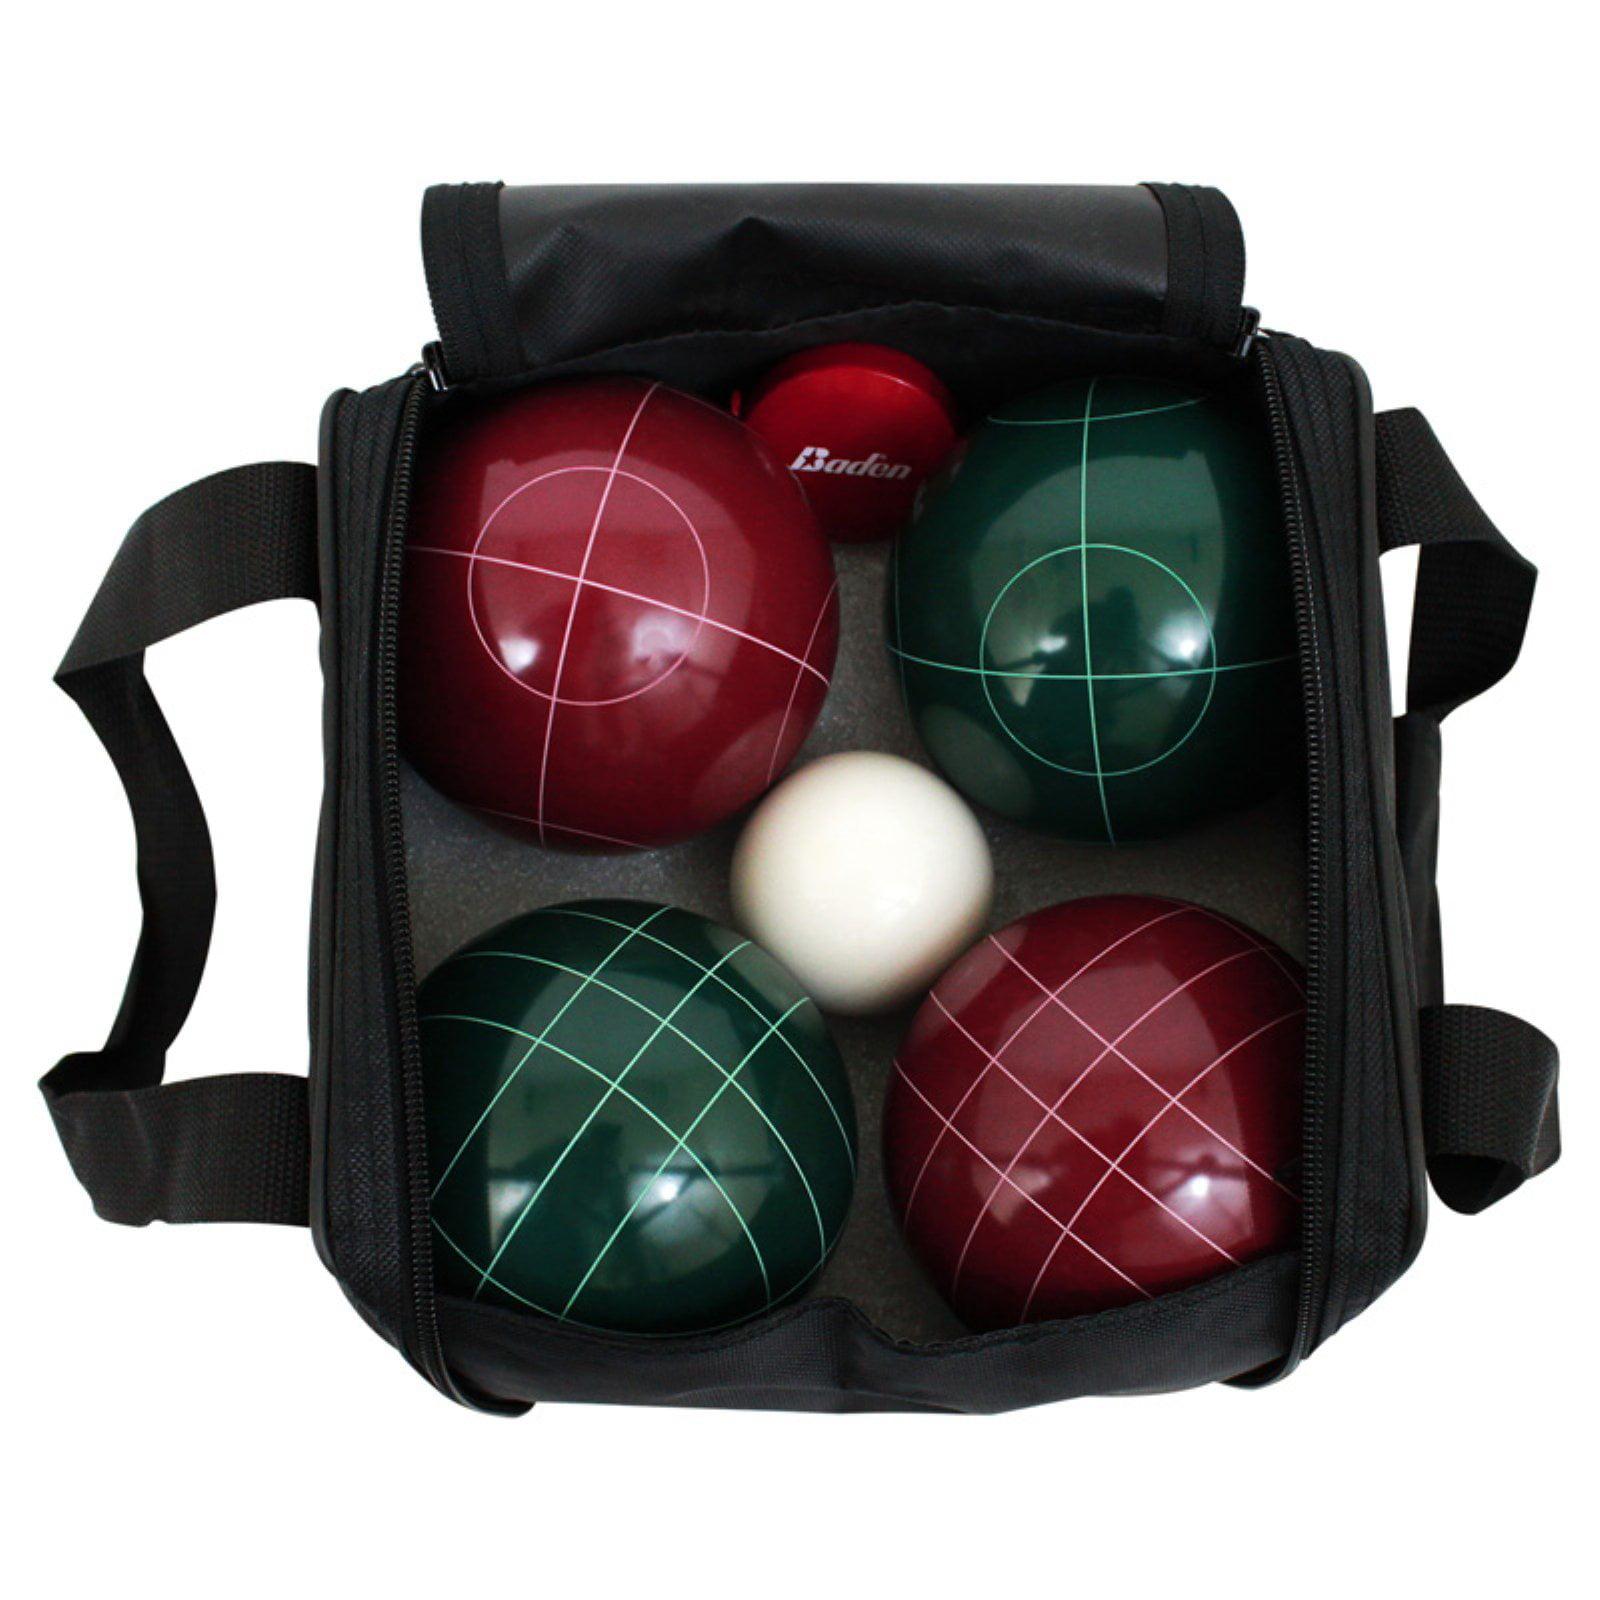 Baden Champions 107mm Bocce Ball Set